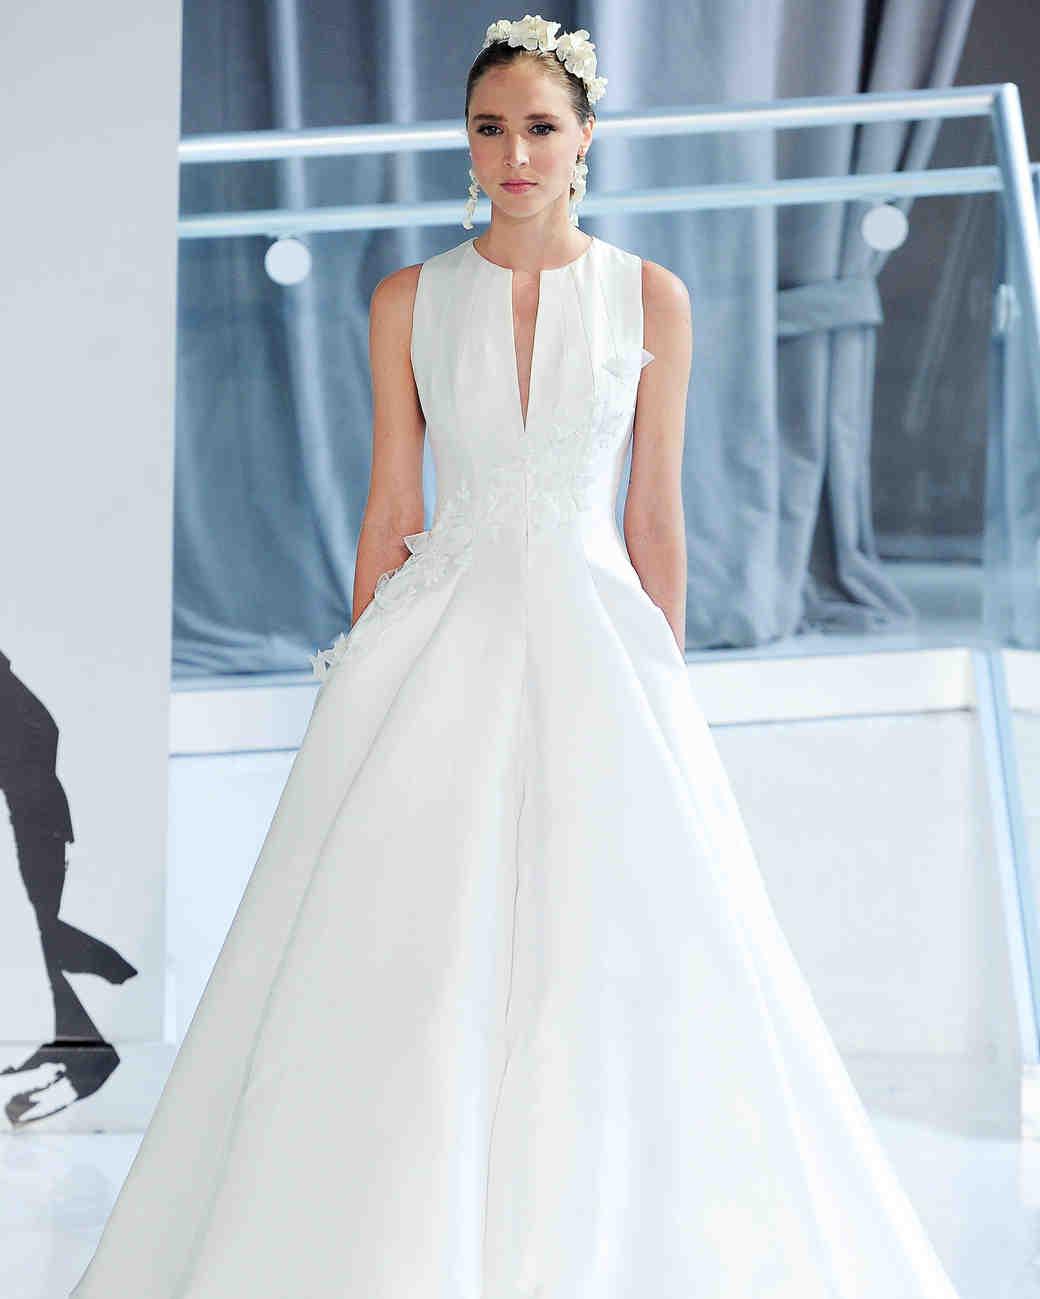 Contemporary Asian Inspired Wedding Dress Model - All Wedding ...